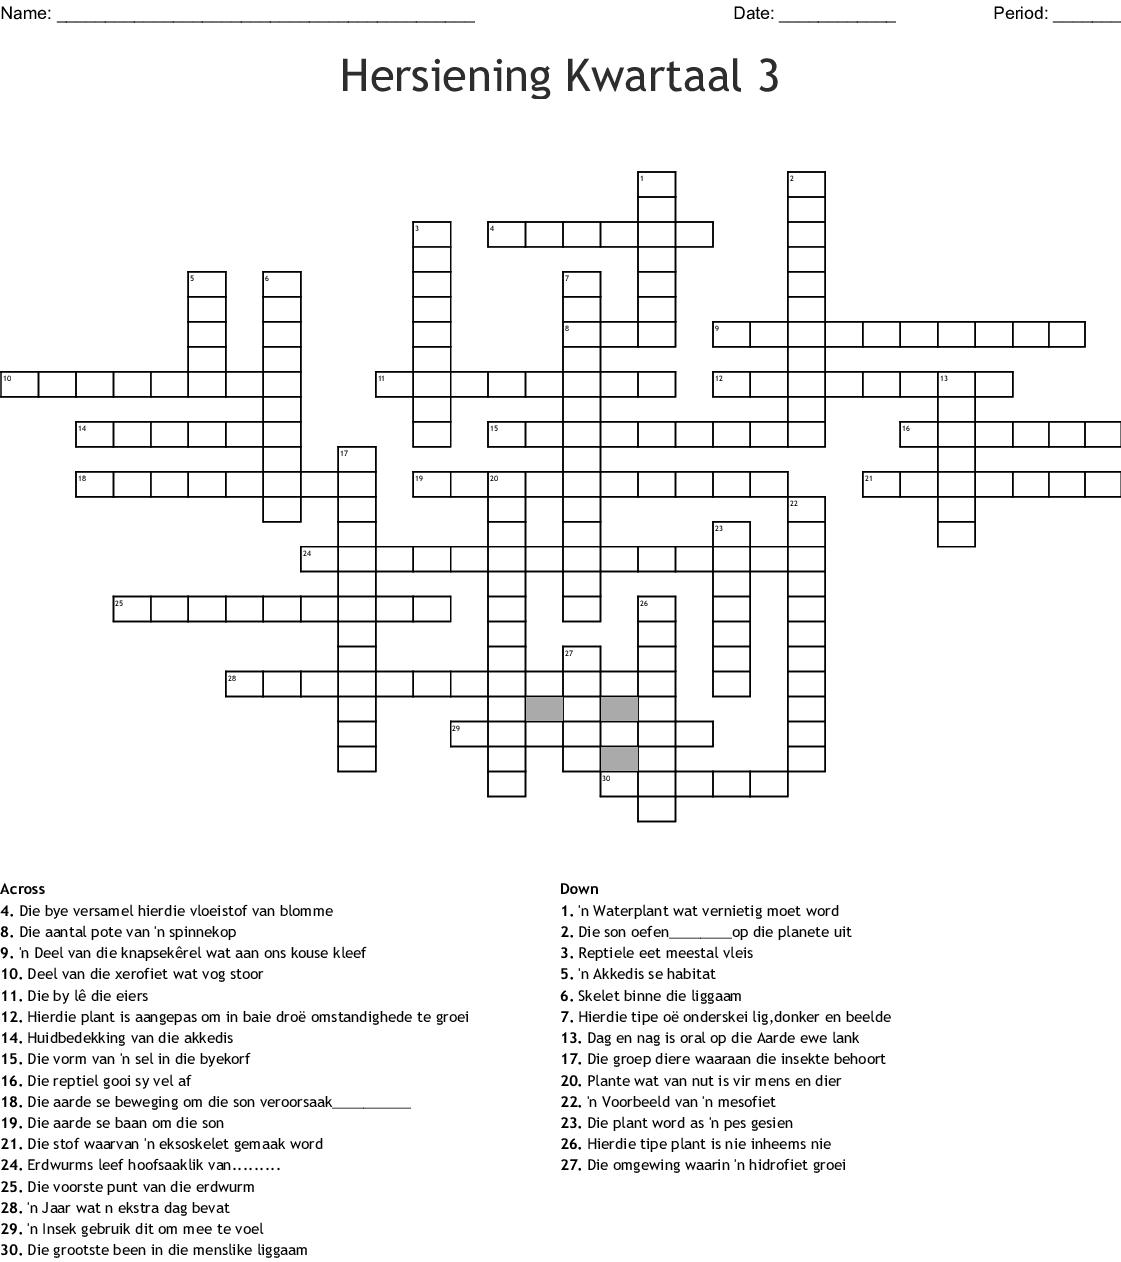 Hersiening Kwartaal 3 Crossword - WordMint